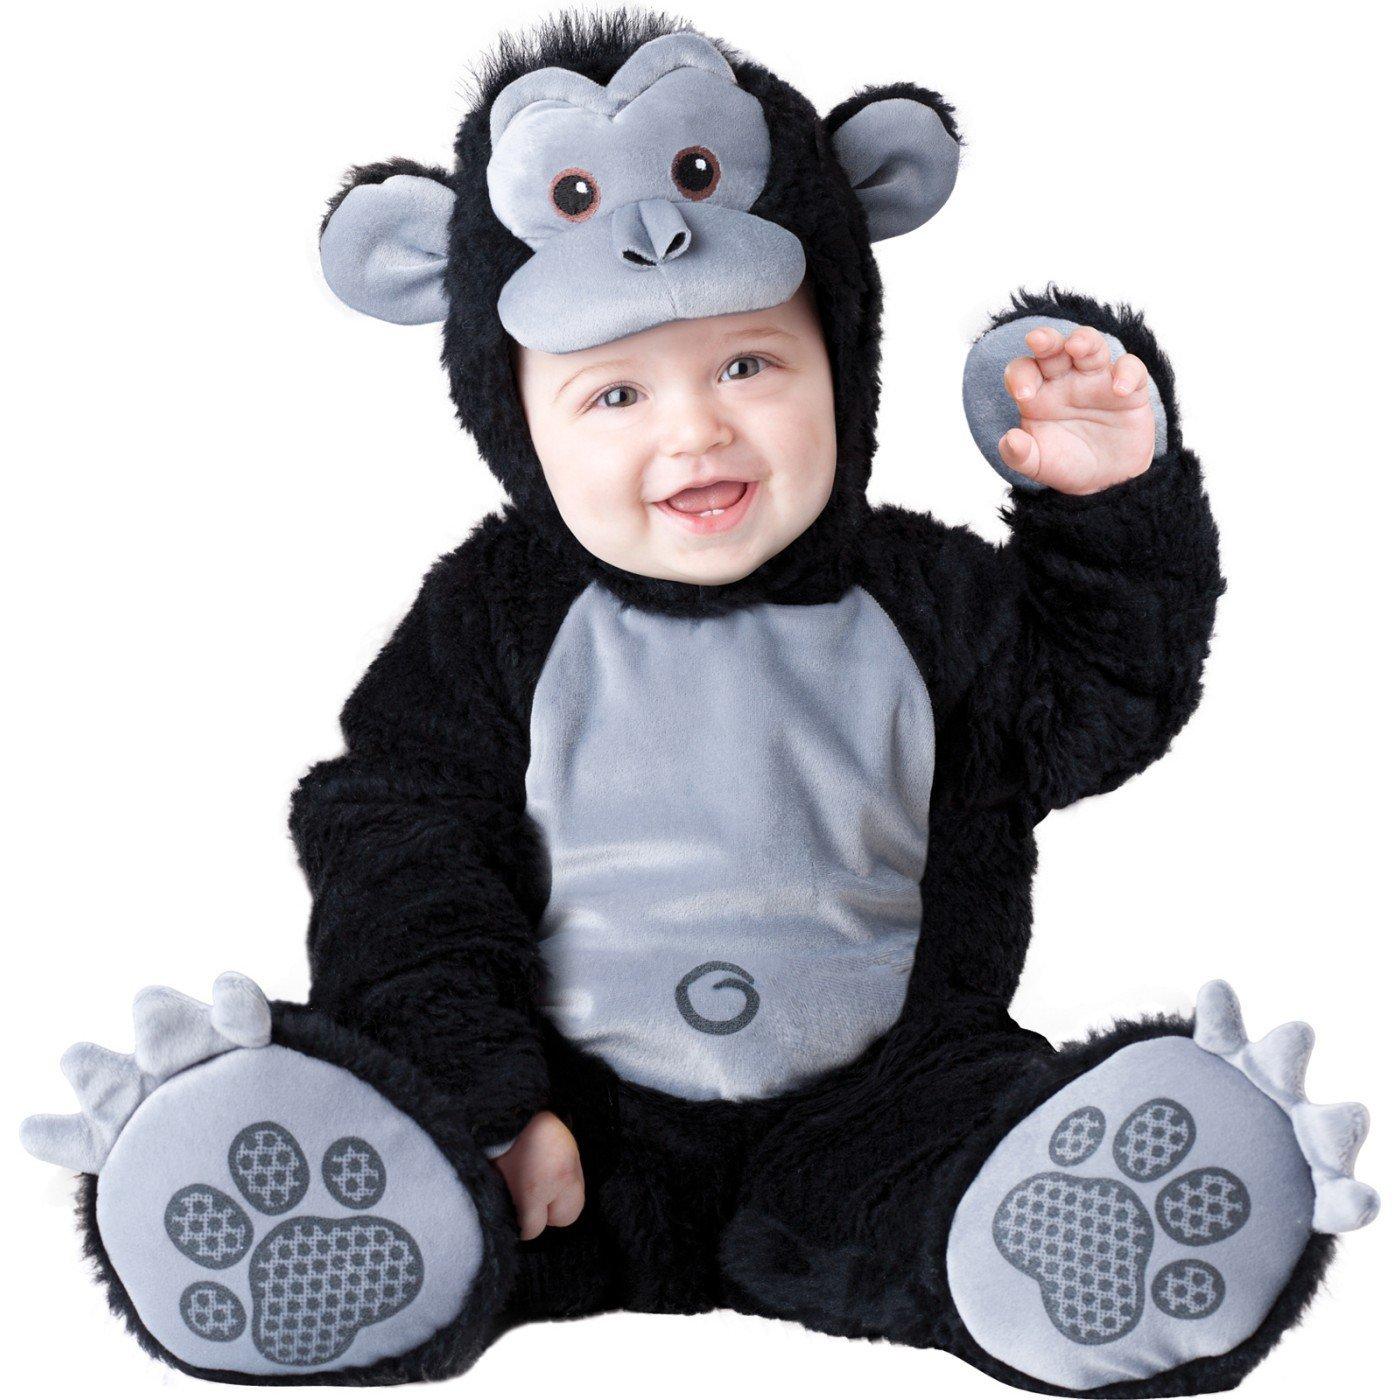 amazoncom incharacter costumes babys goofy gorilla costume clothing - Halloween Monkey Costumes